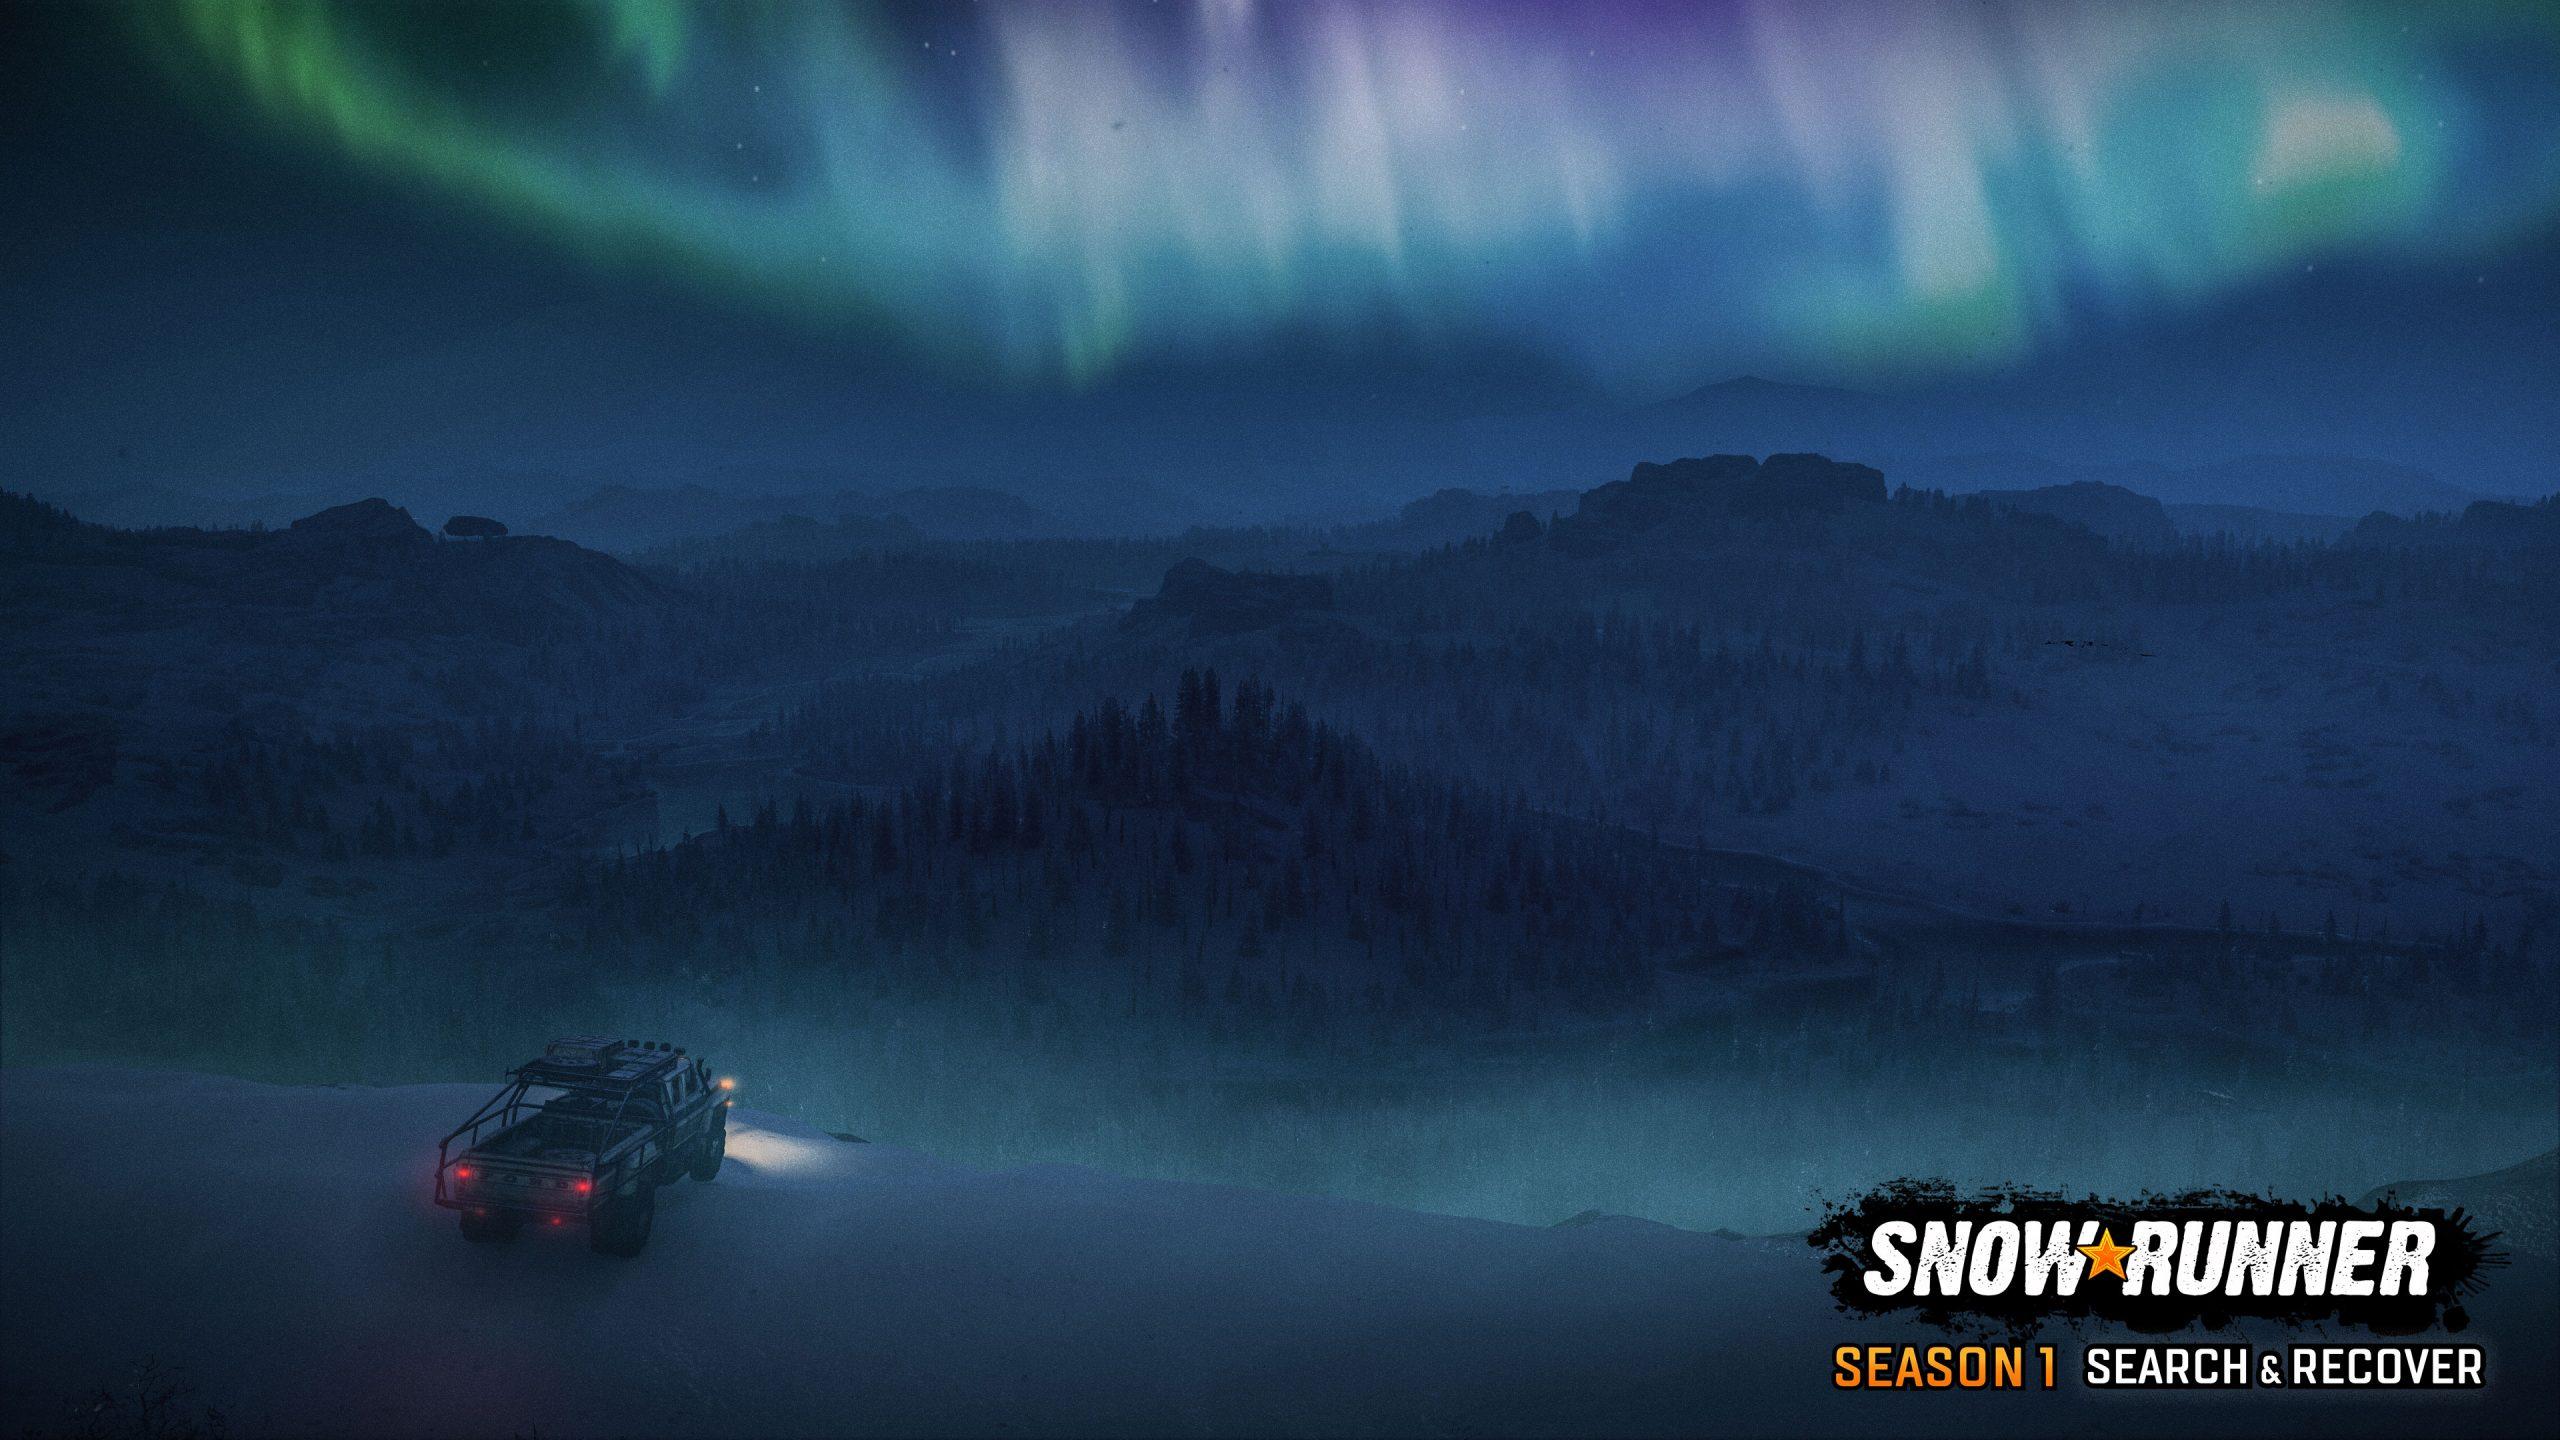 SnowRunner Season1 screenshot logo 02 scaled - SnowRunner Gets Its First Big DLC Next Week